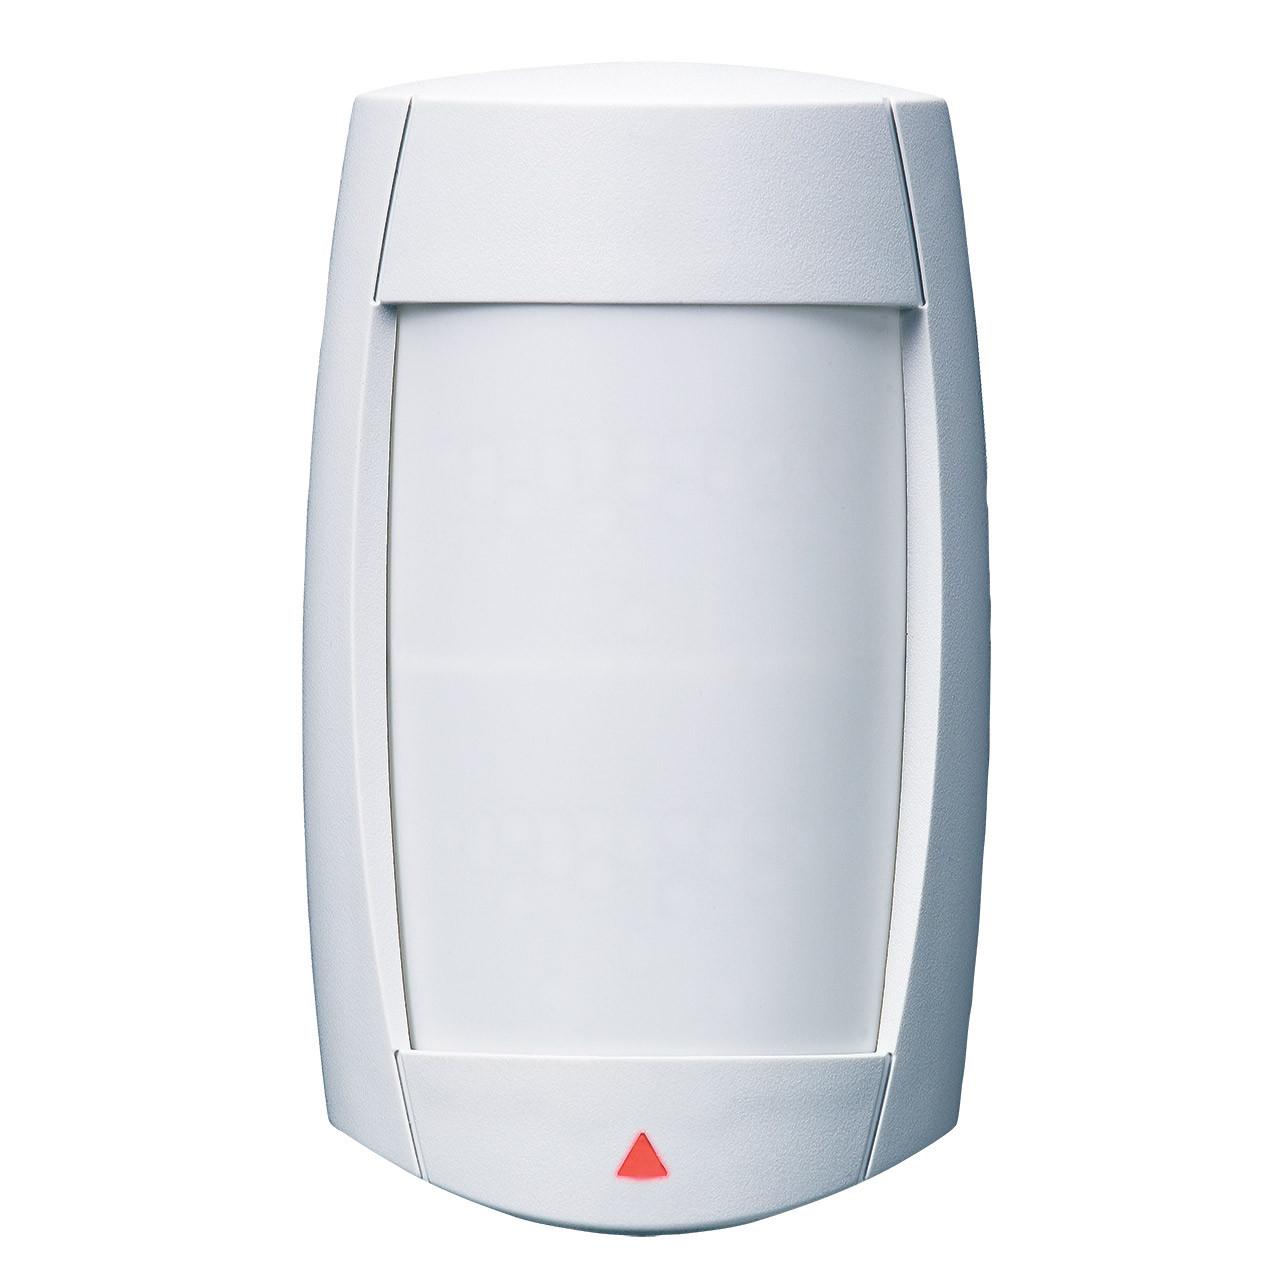 Wireless Surveillance Cameras Audio